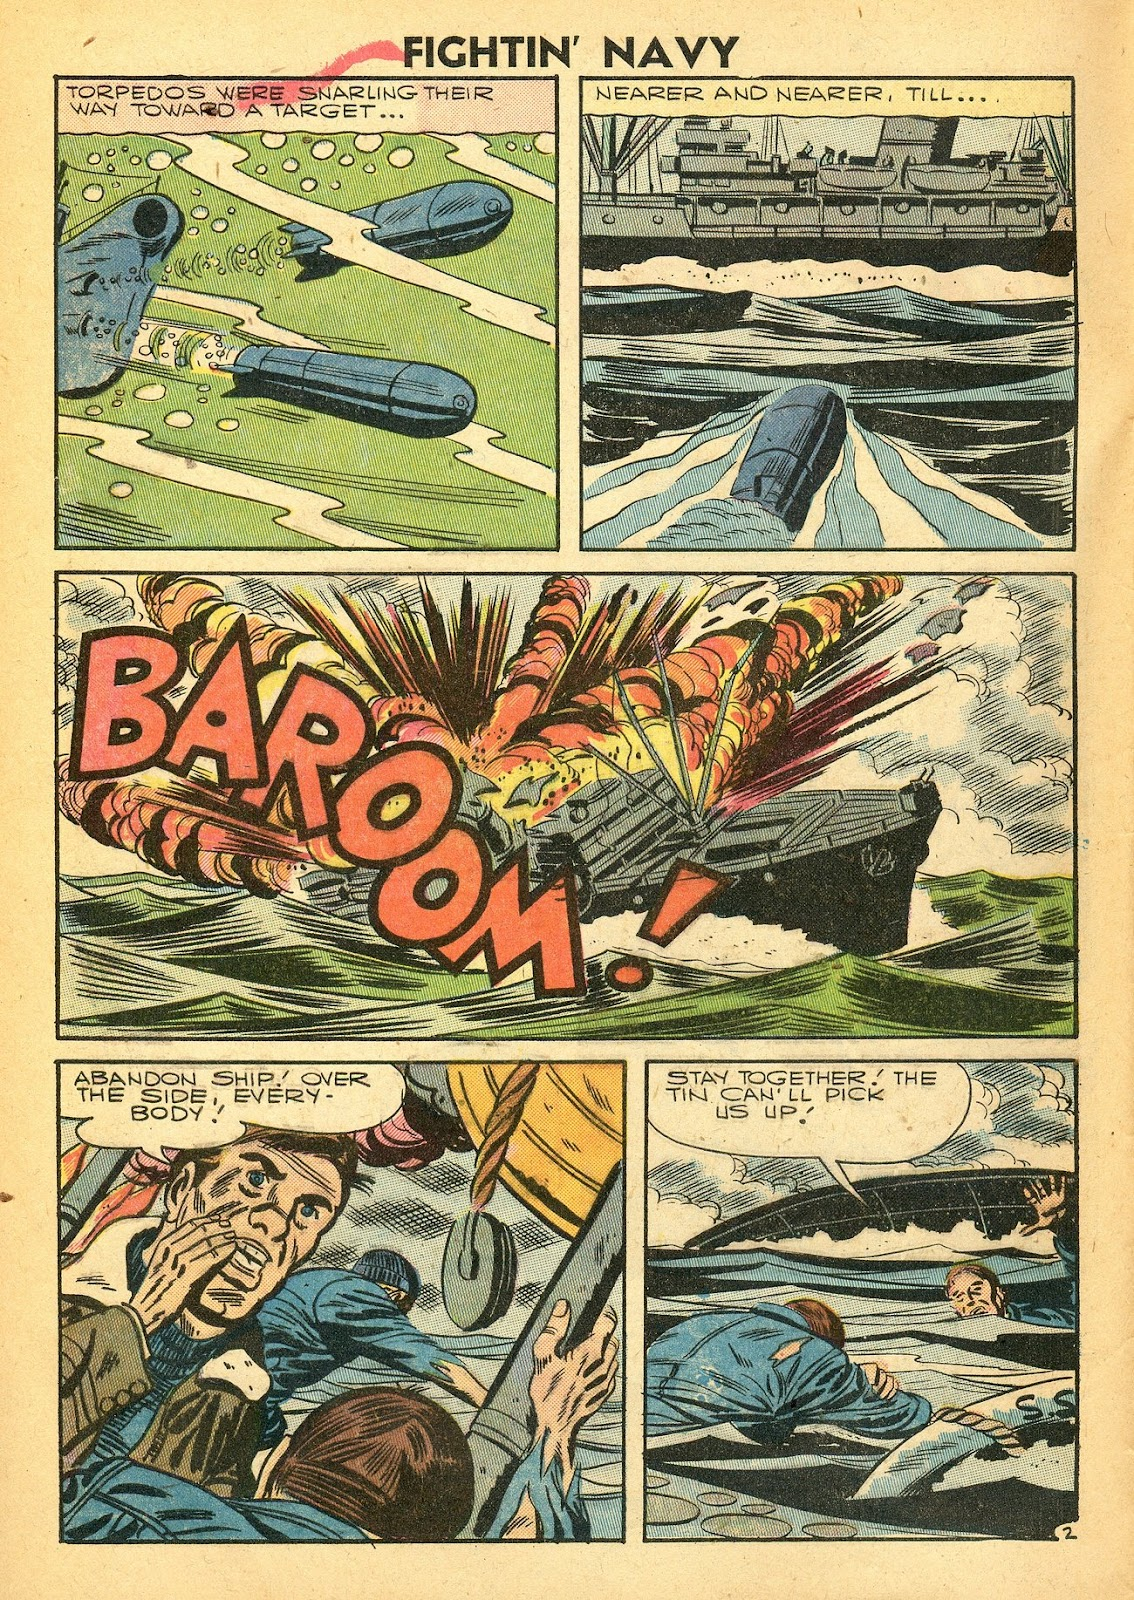 Read online Fightin' Navy comic -  Issue #77 - 4